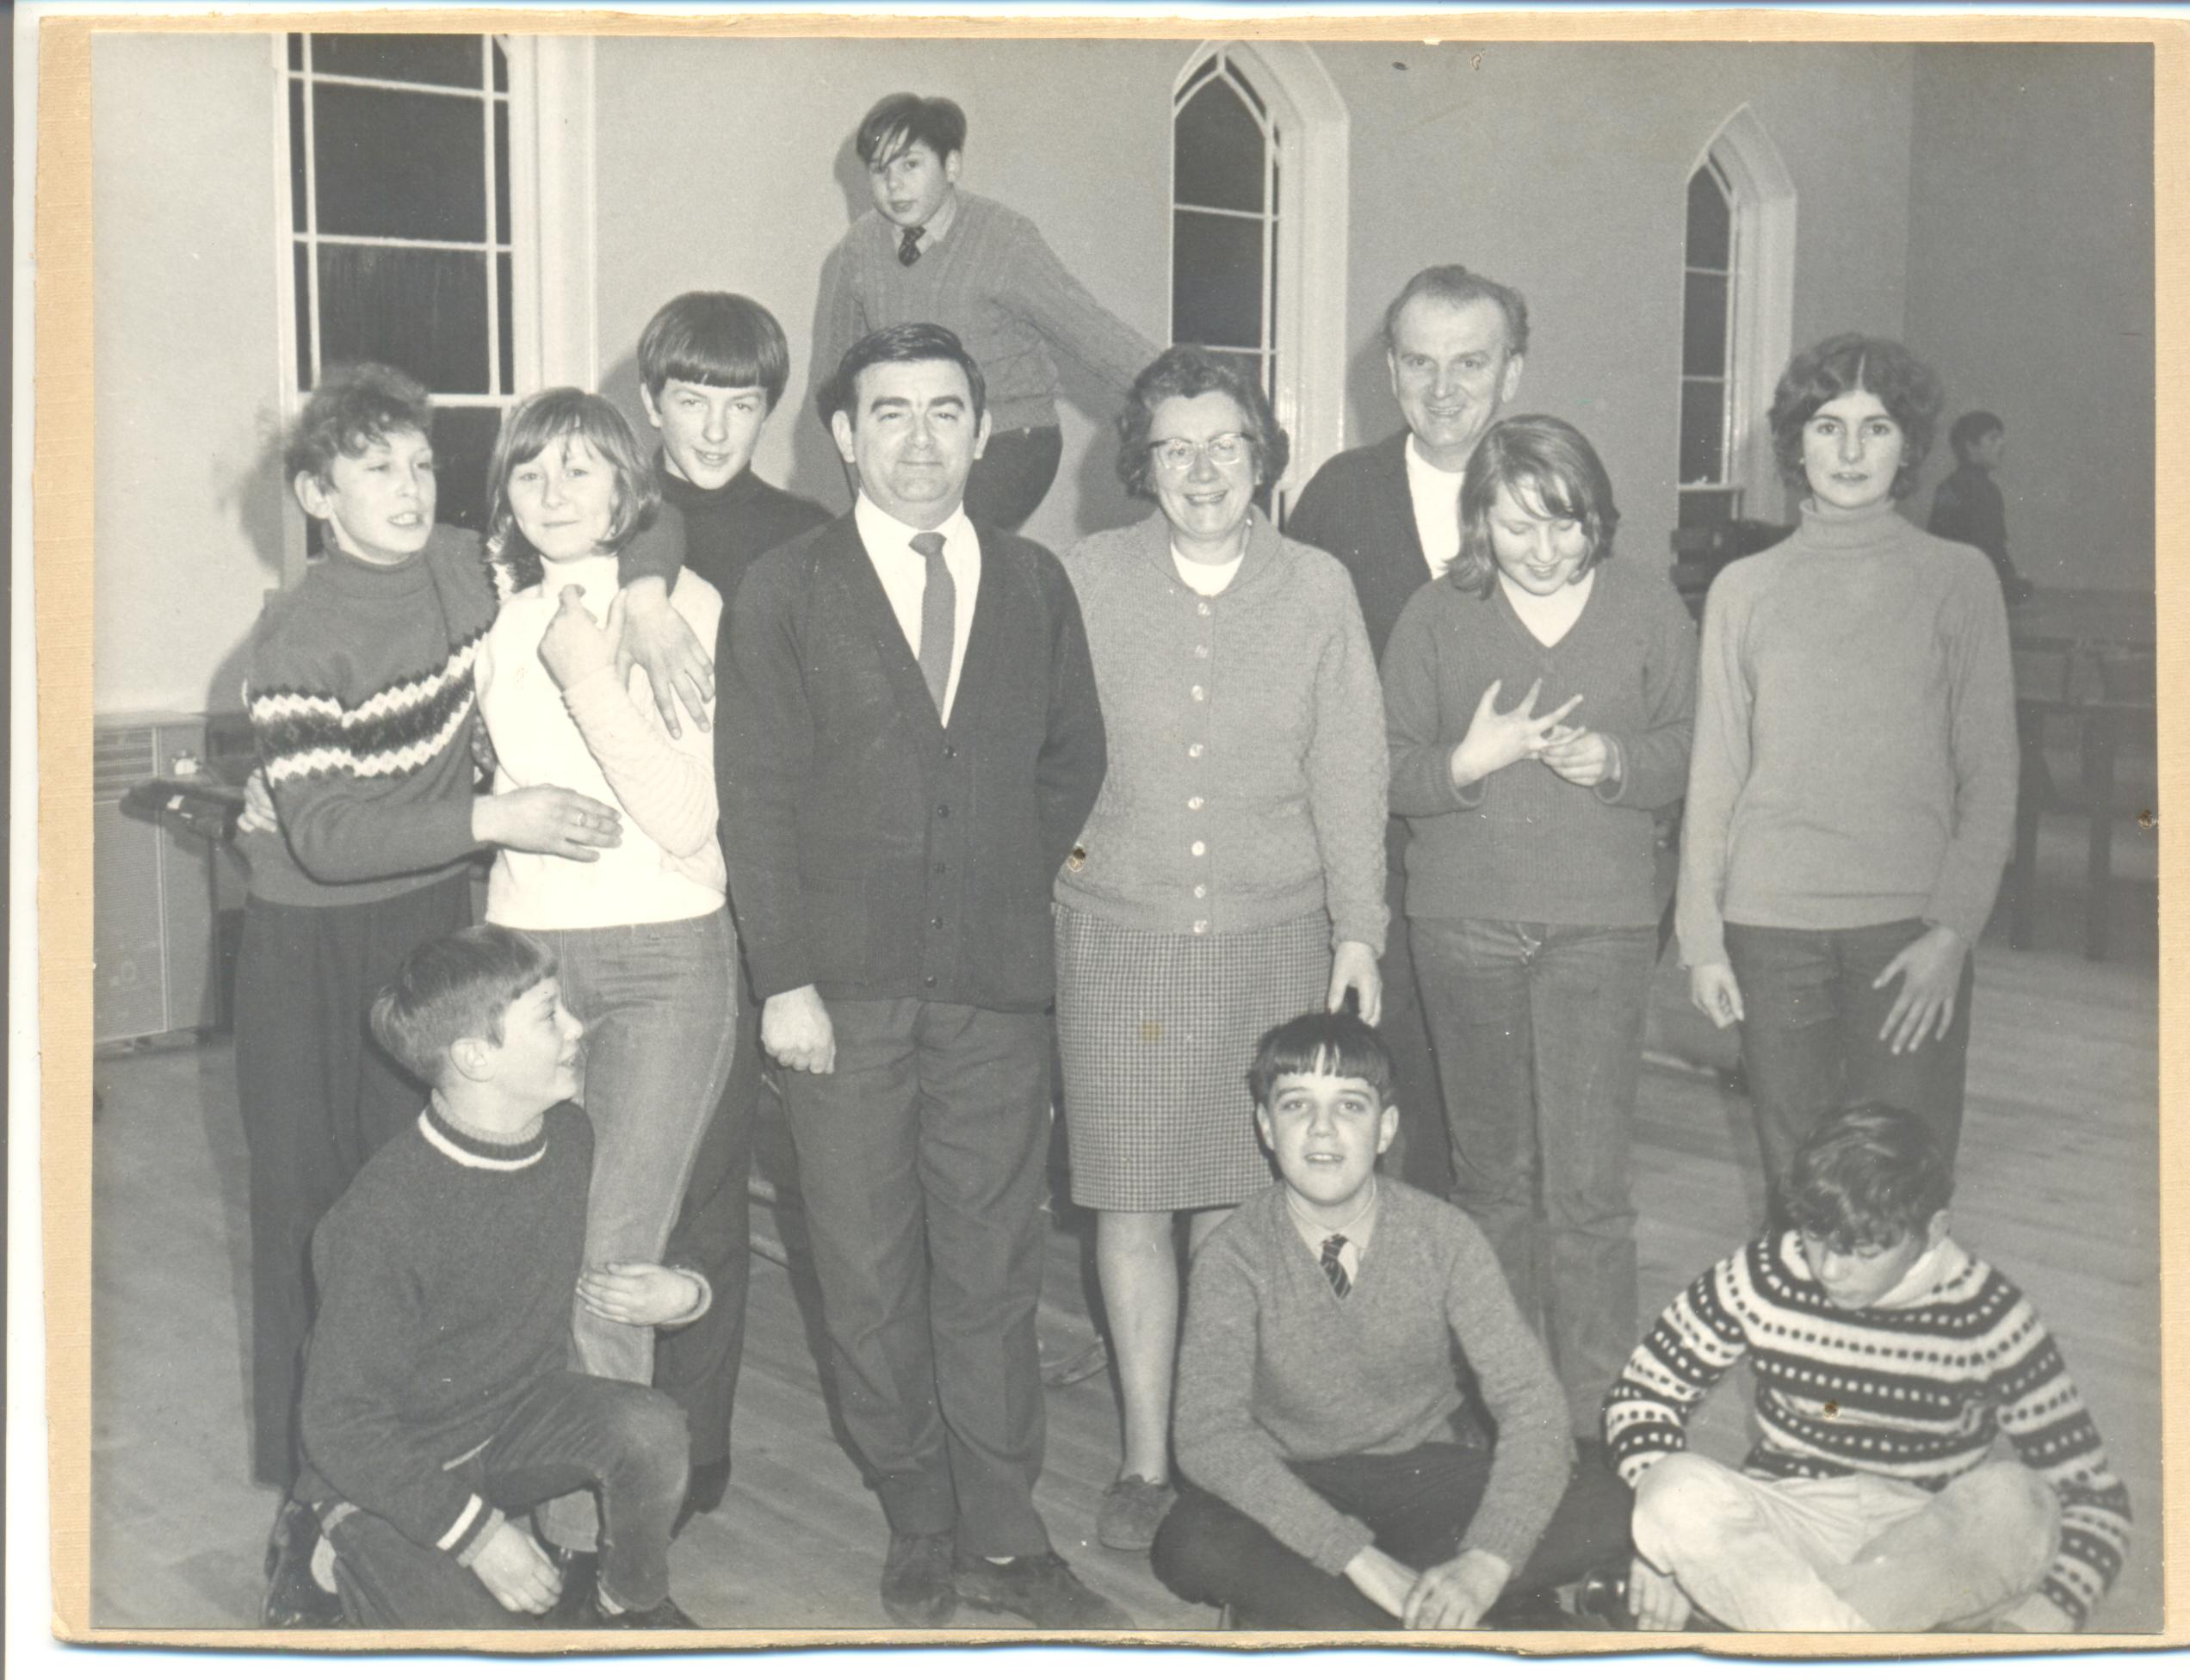 Left to Right - Bob Hollings, Dorothy Clark and Arthur Clark